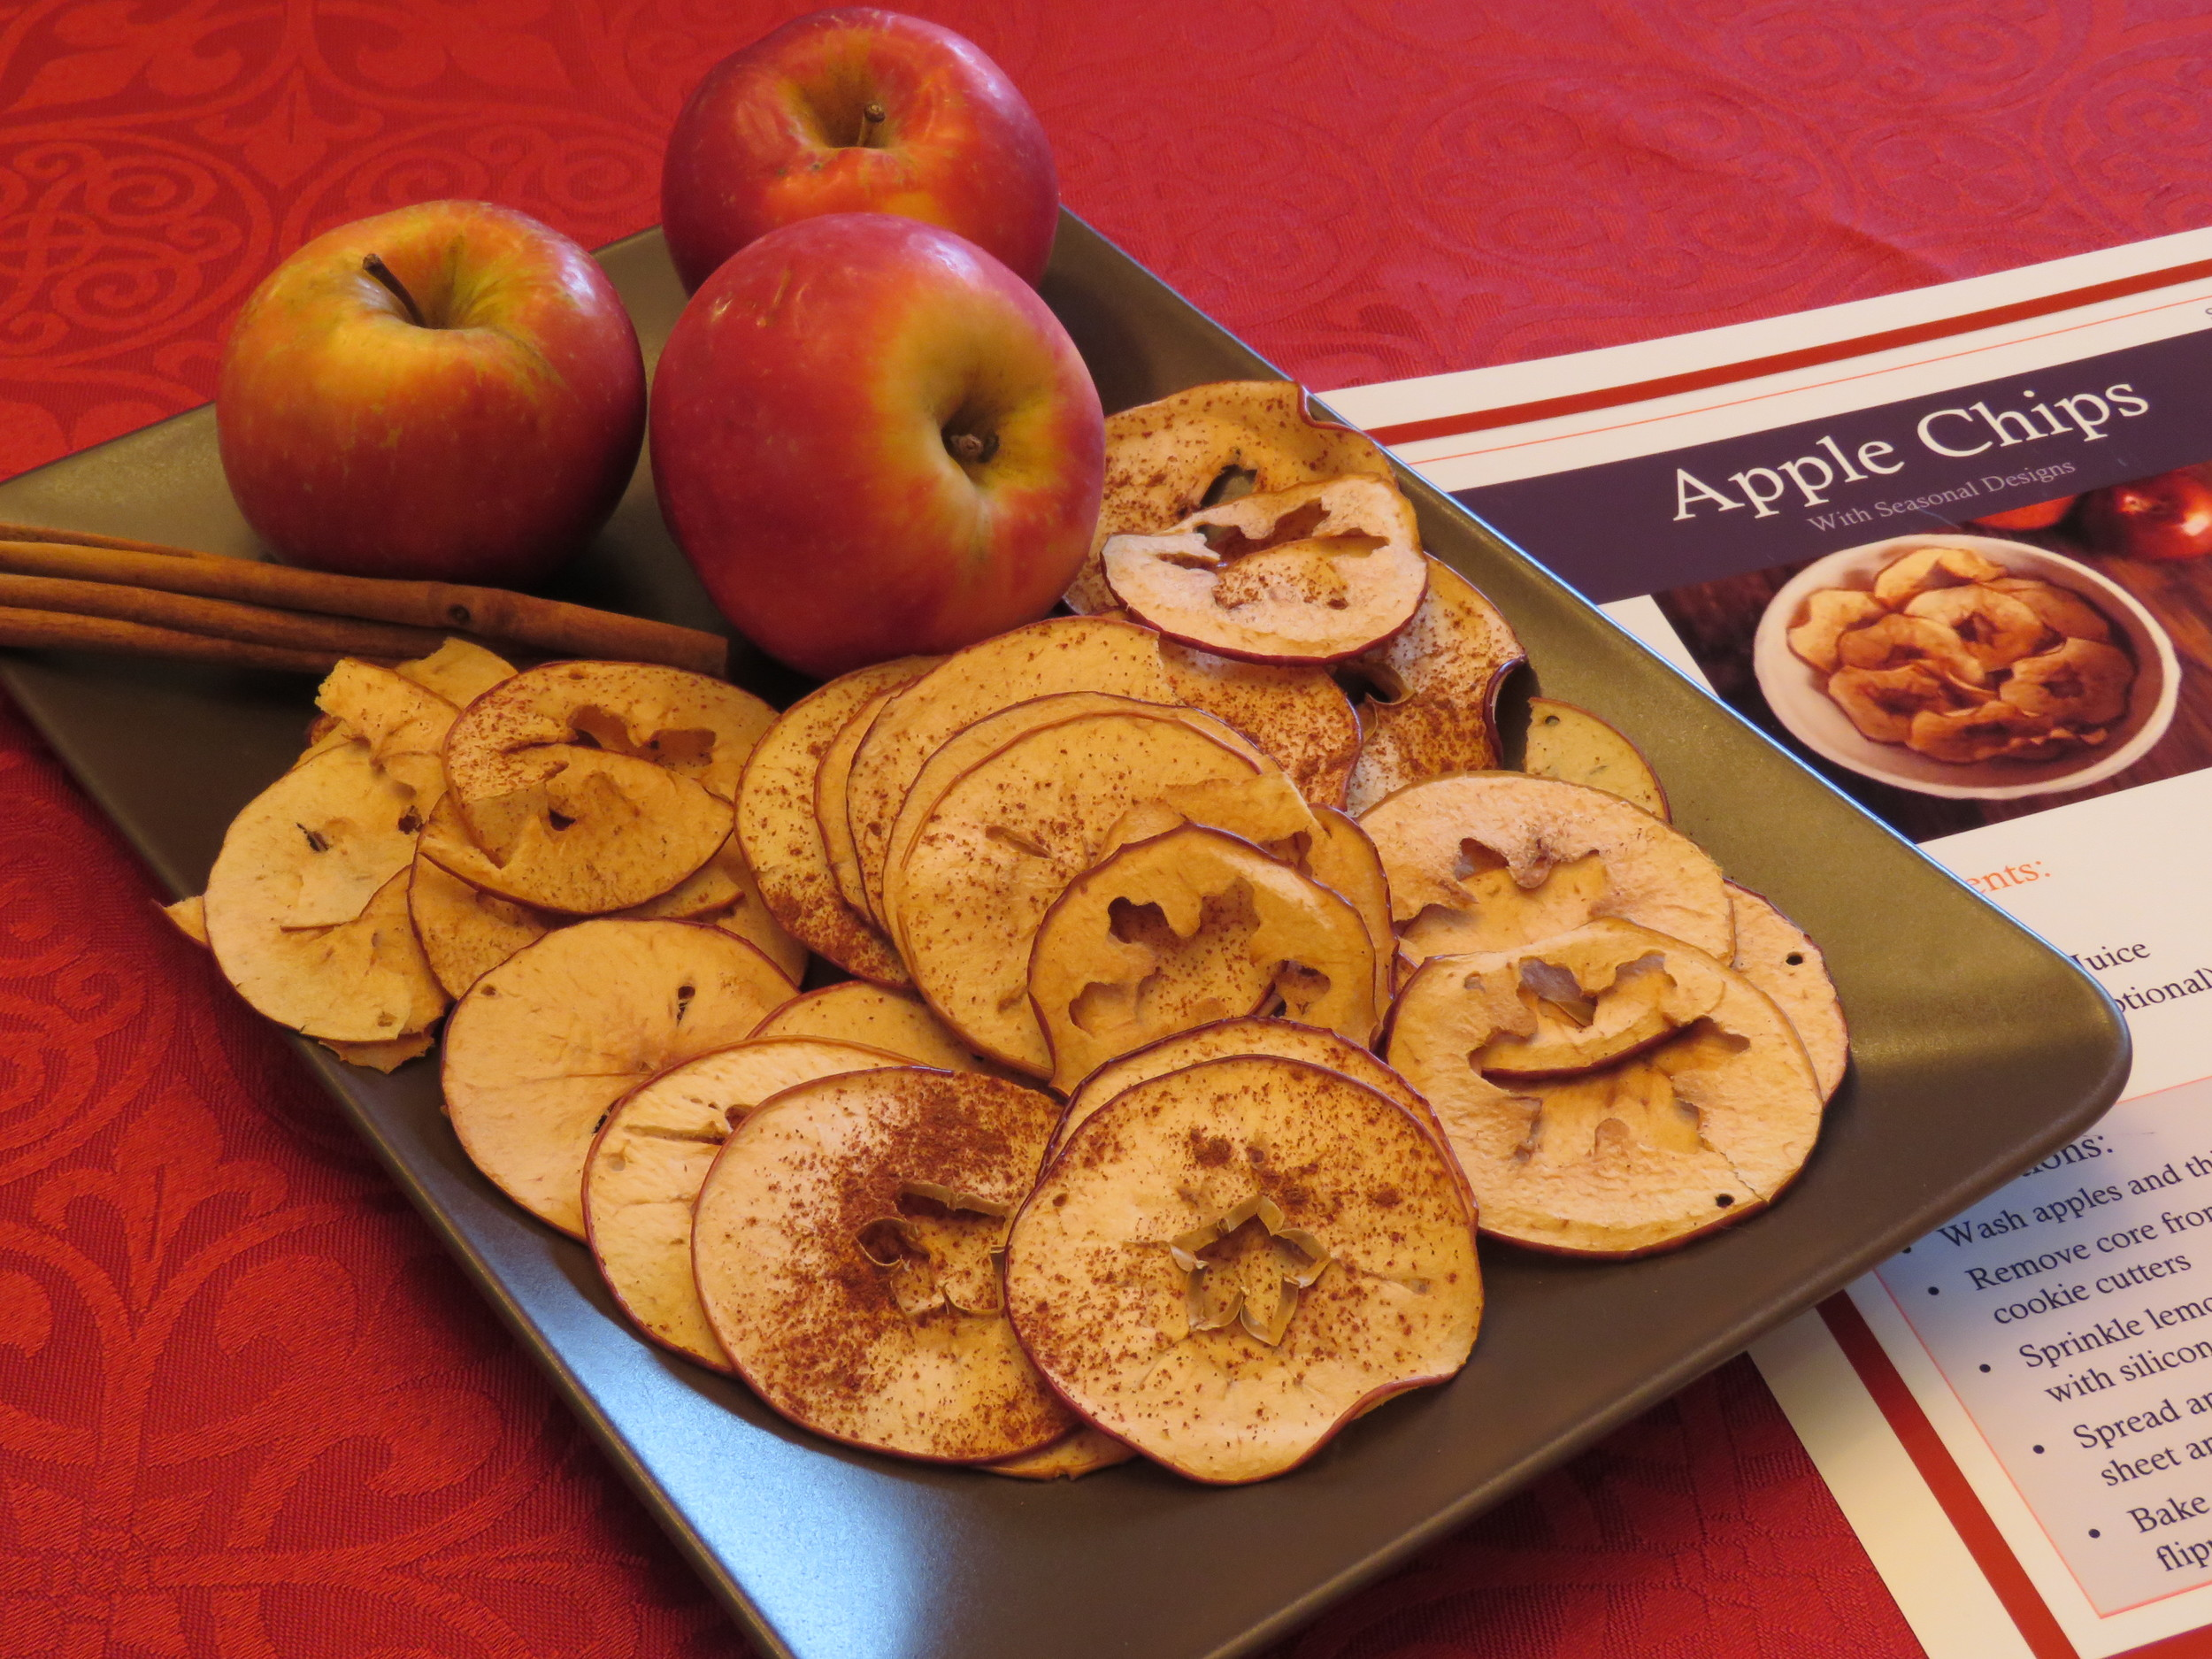 Apple chips 1